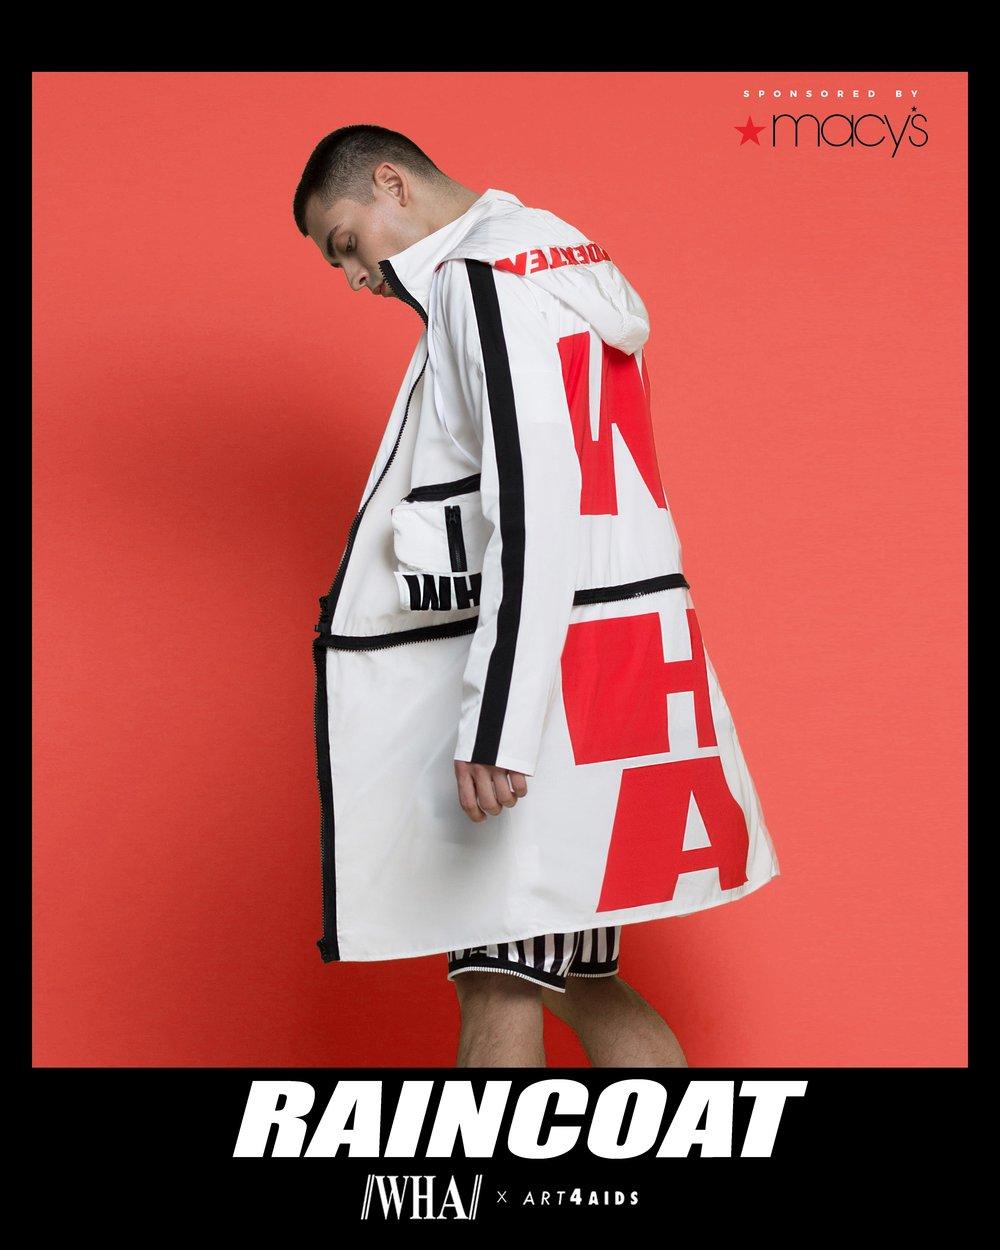 RAINCOAT 5.jpg